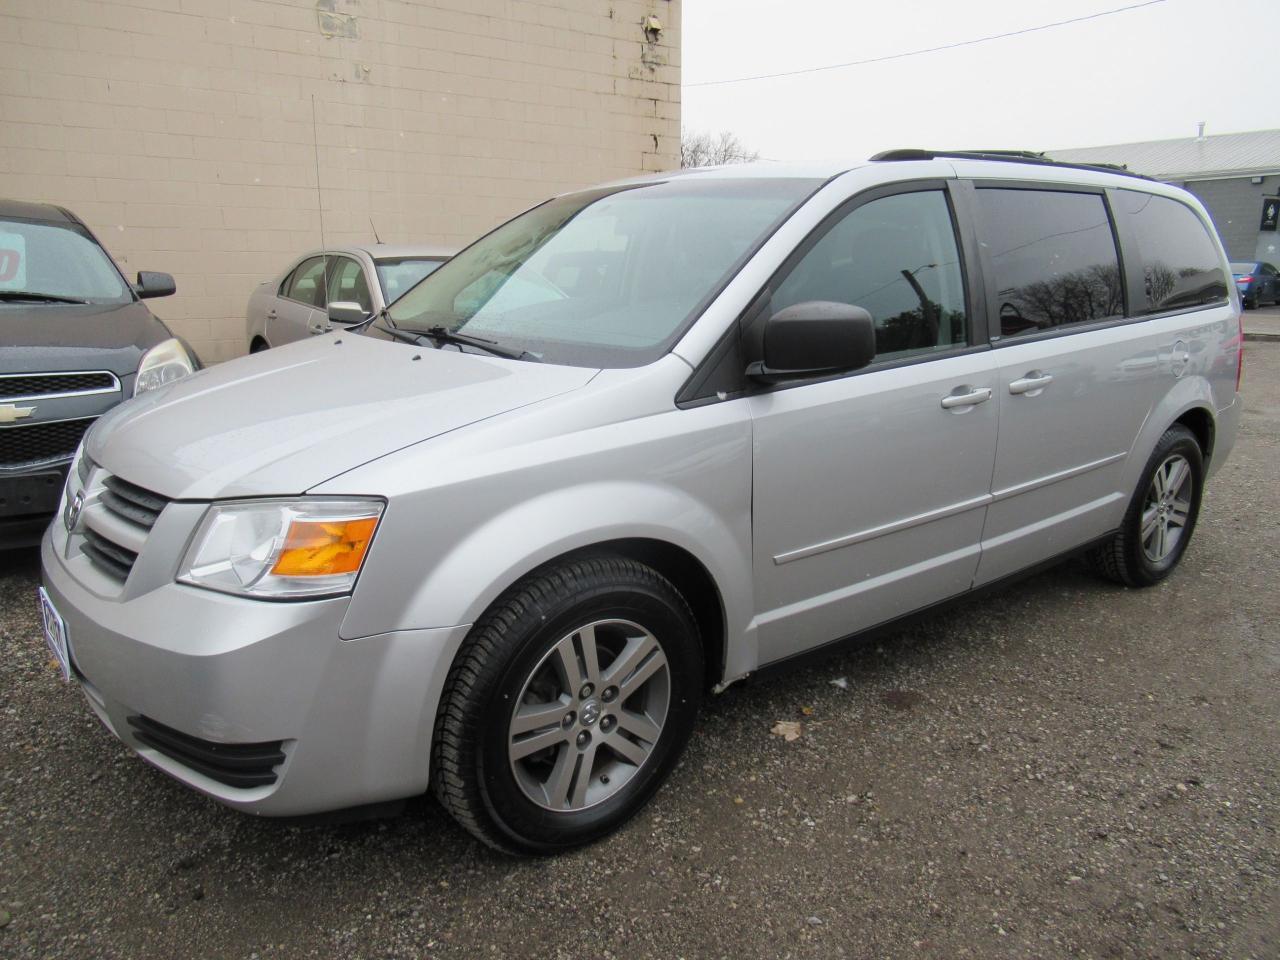 2010 Dodge Grand Caravan SE *Clean Carproof* Certified w/ 6 Month Warranty